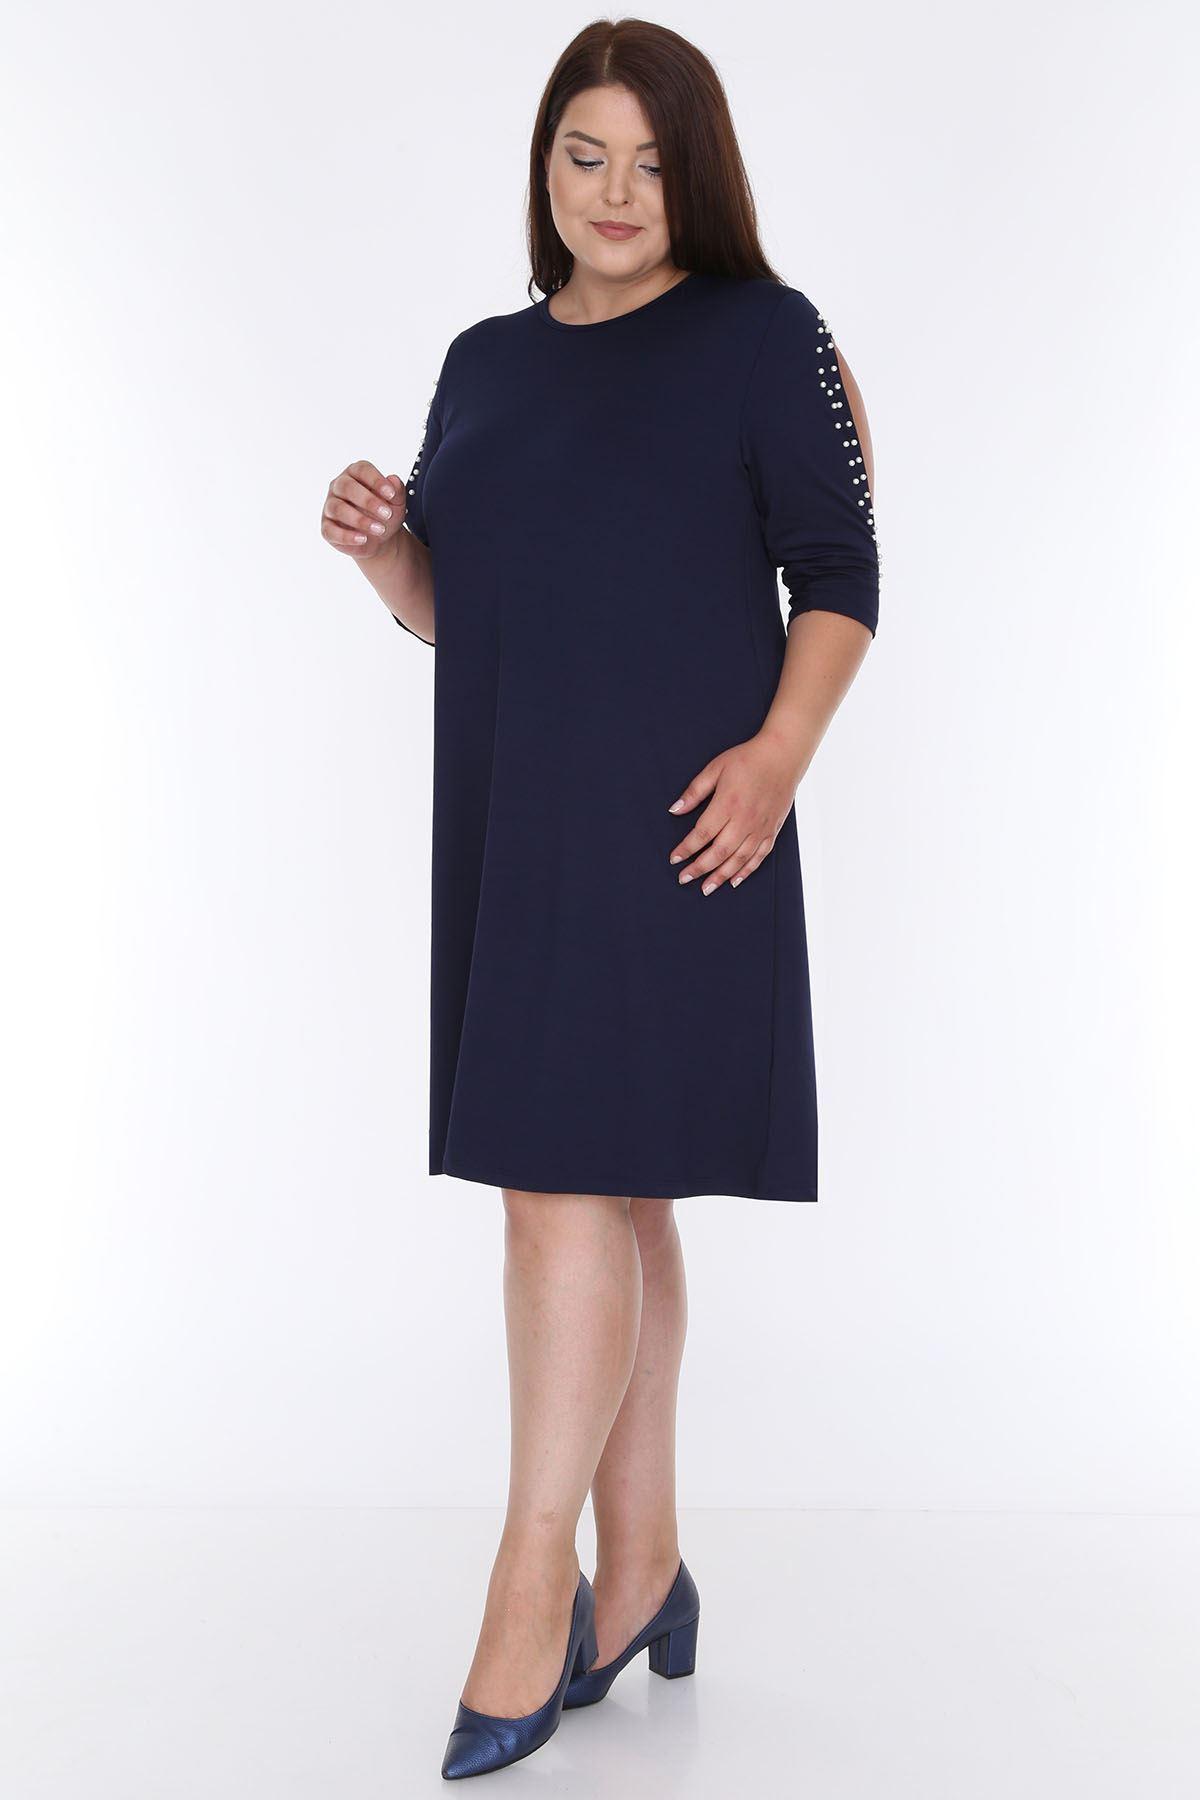 Kol İncili Lacivert Büyük Beden Elbise 6E-0607